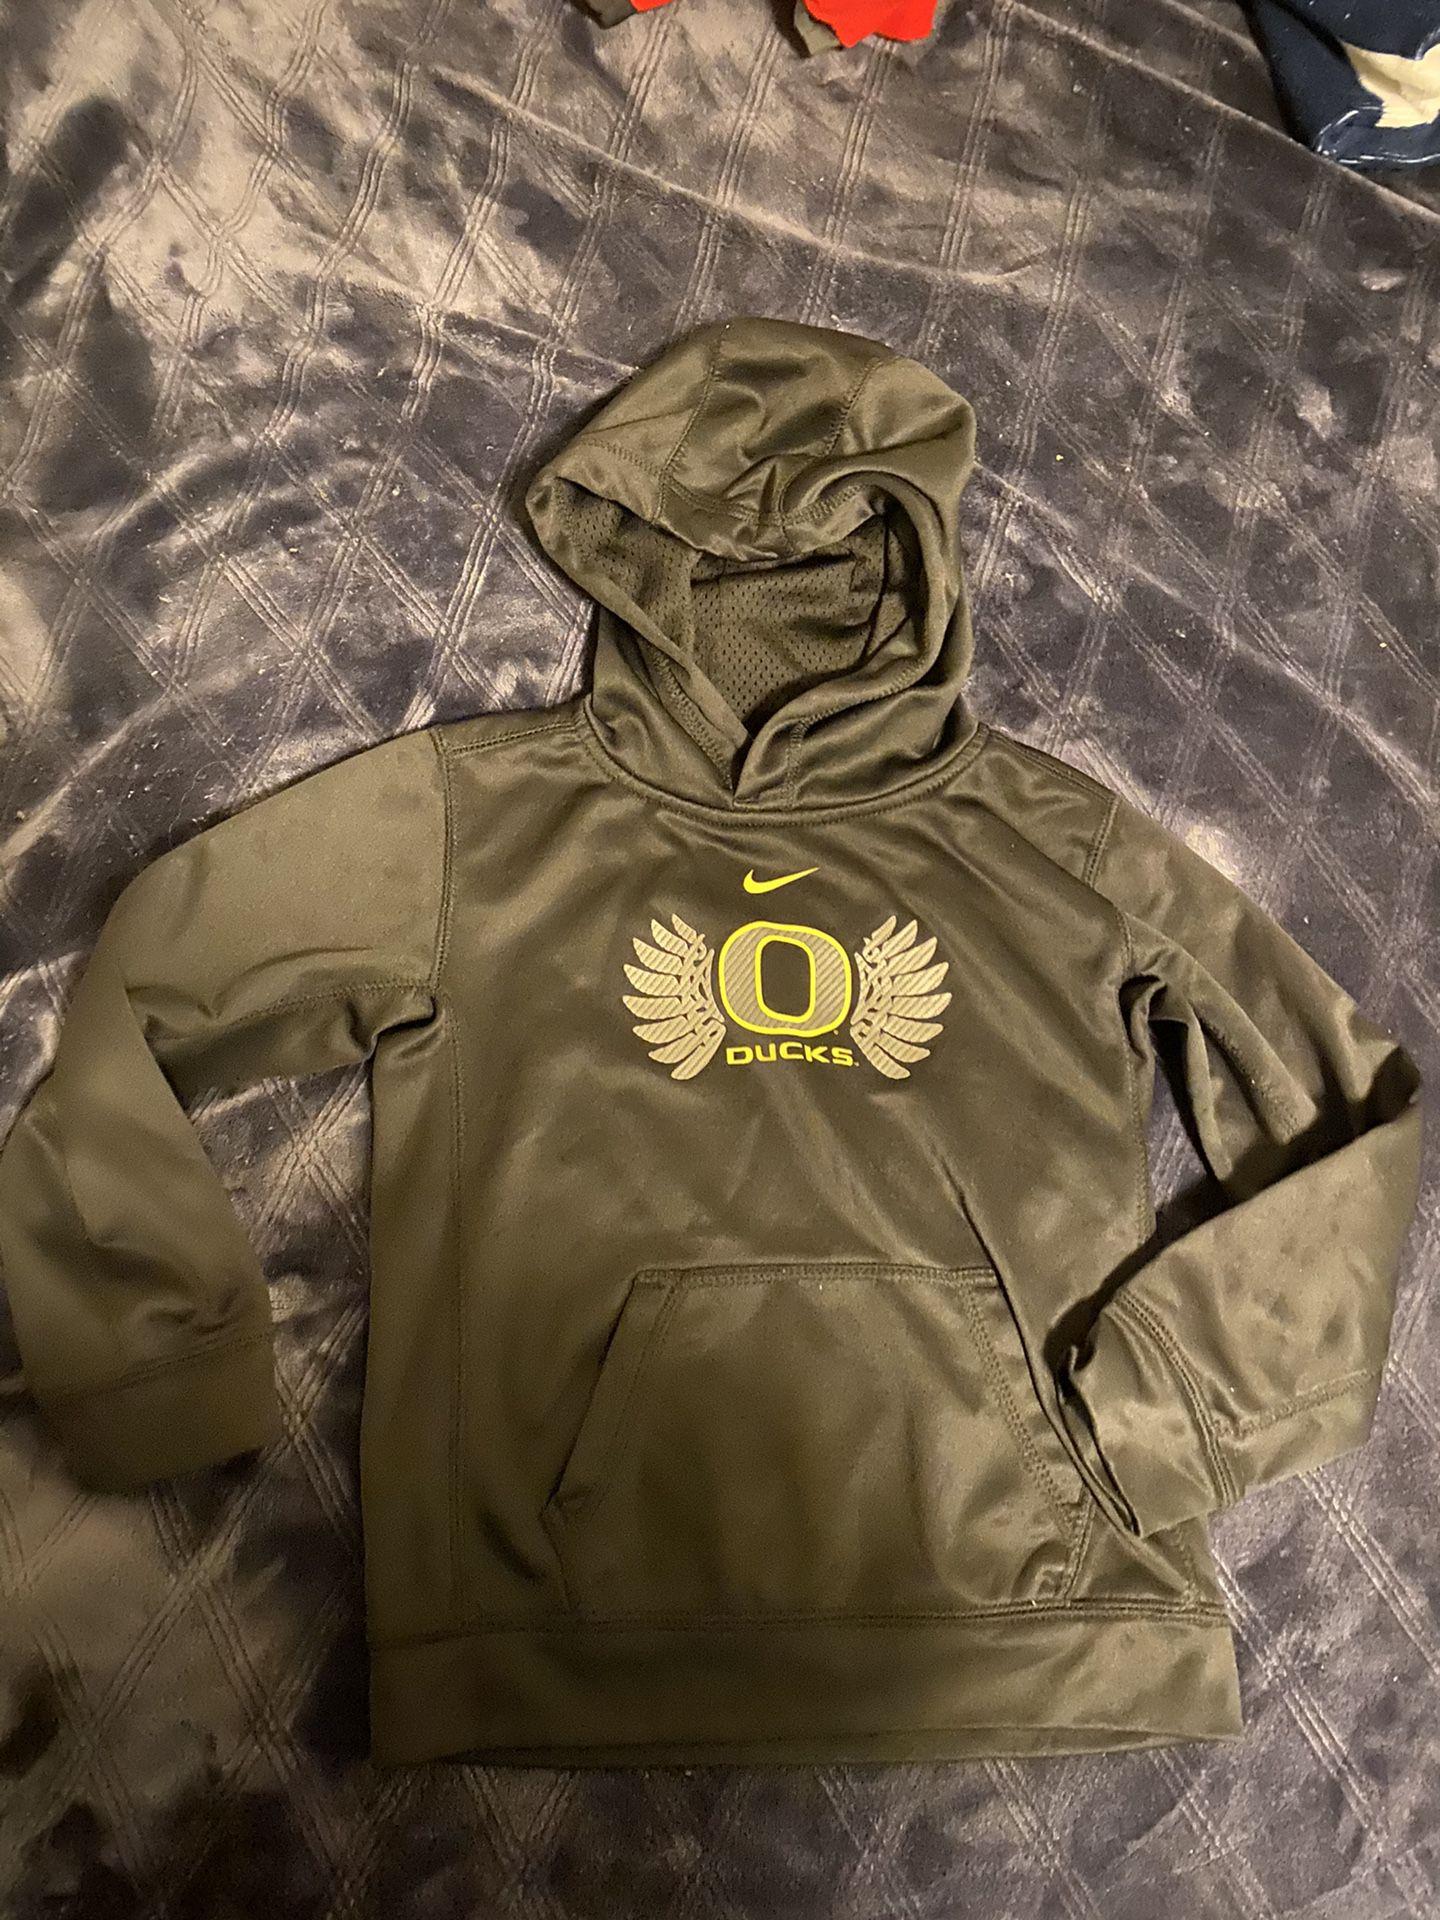 Boys size 7 Nike Oregon ducks sweater